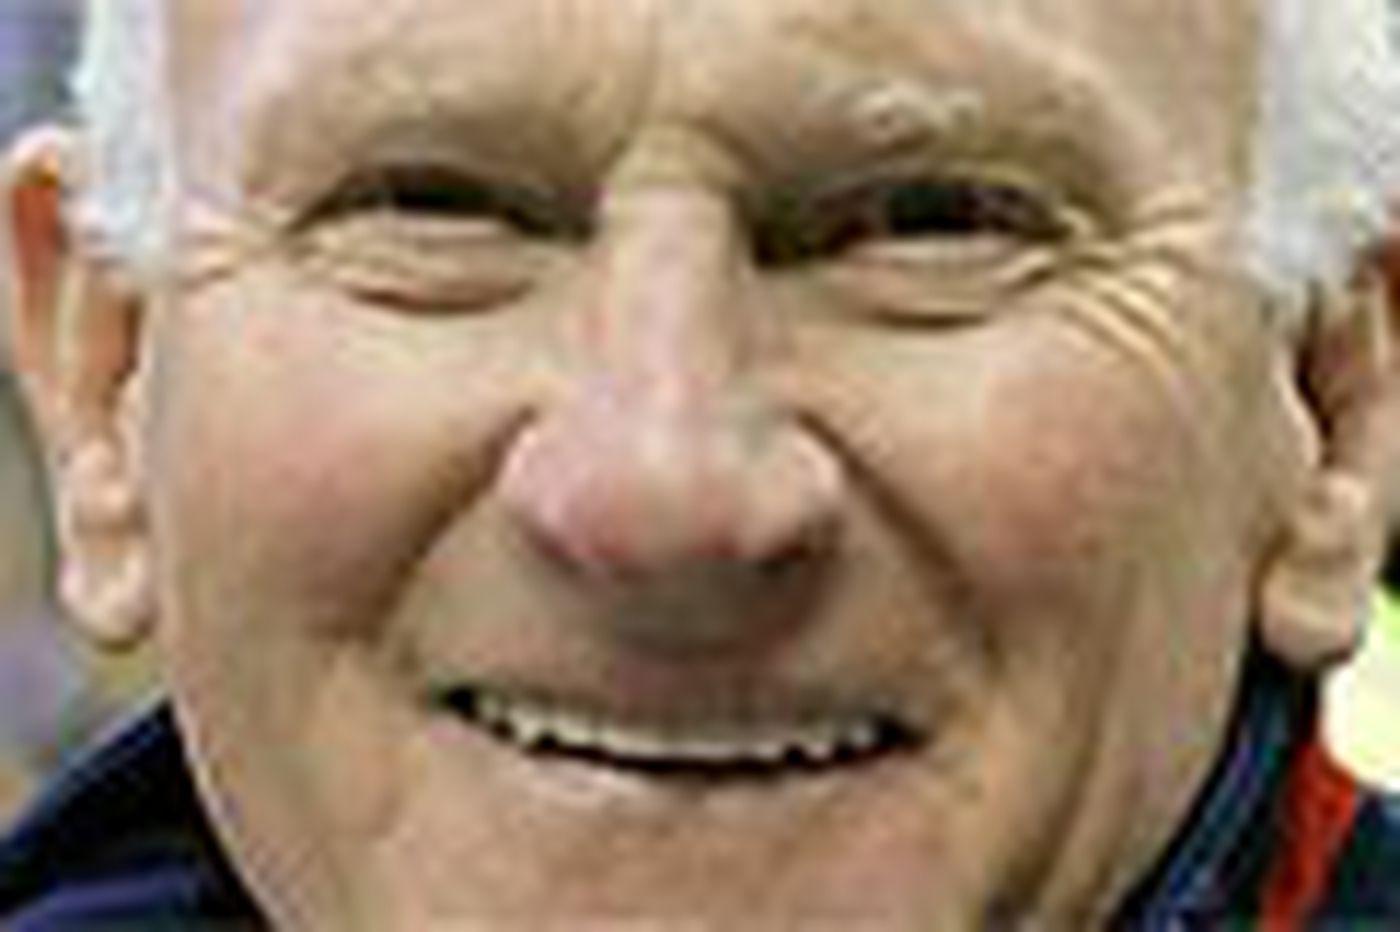 Hall of Famer Killebrew dies at 74